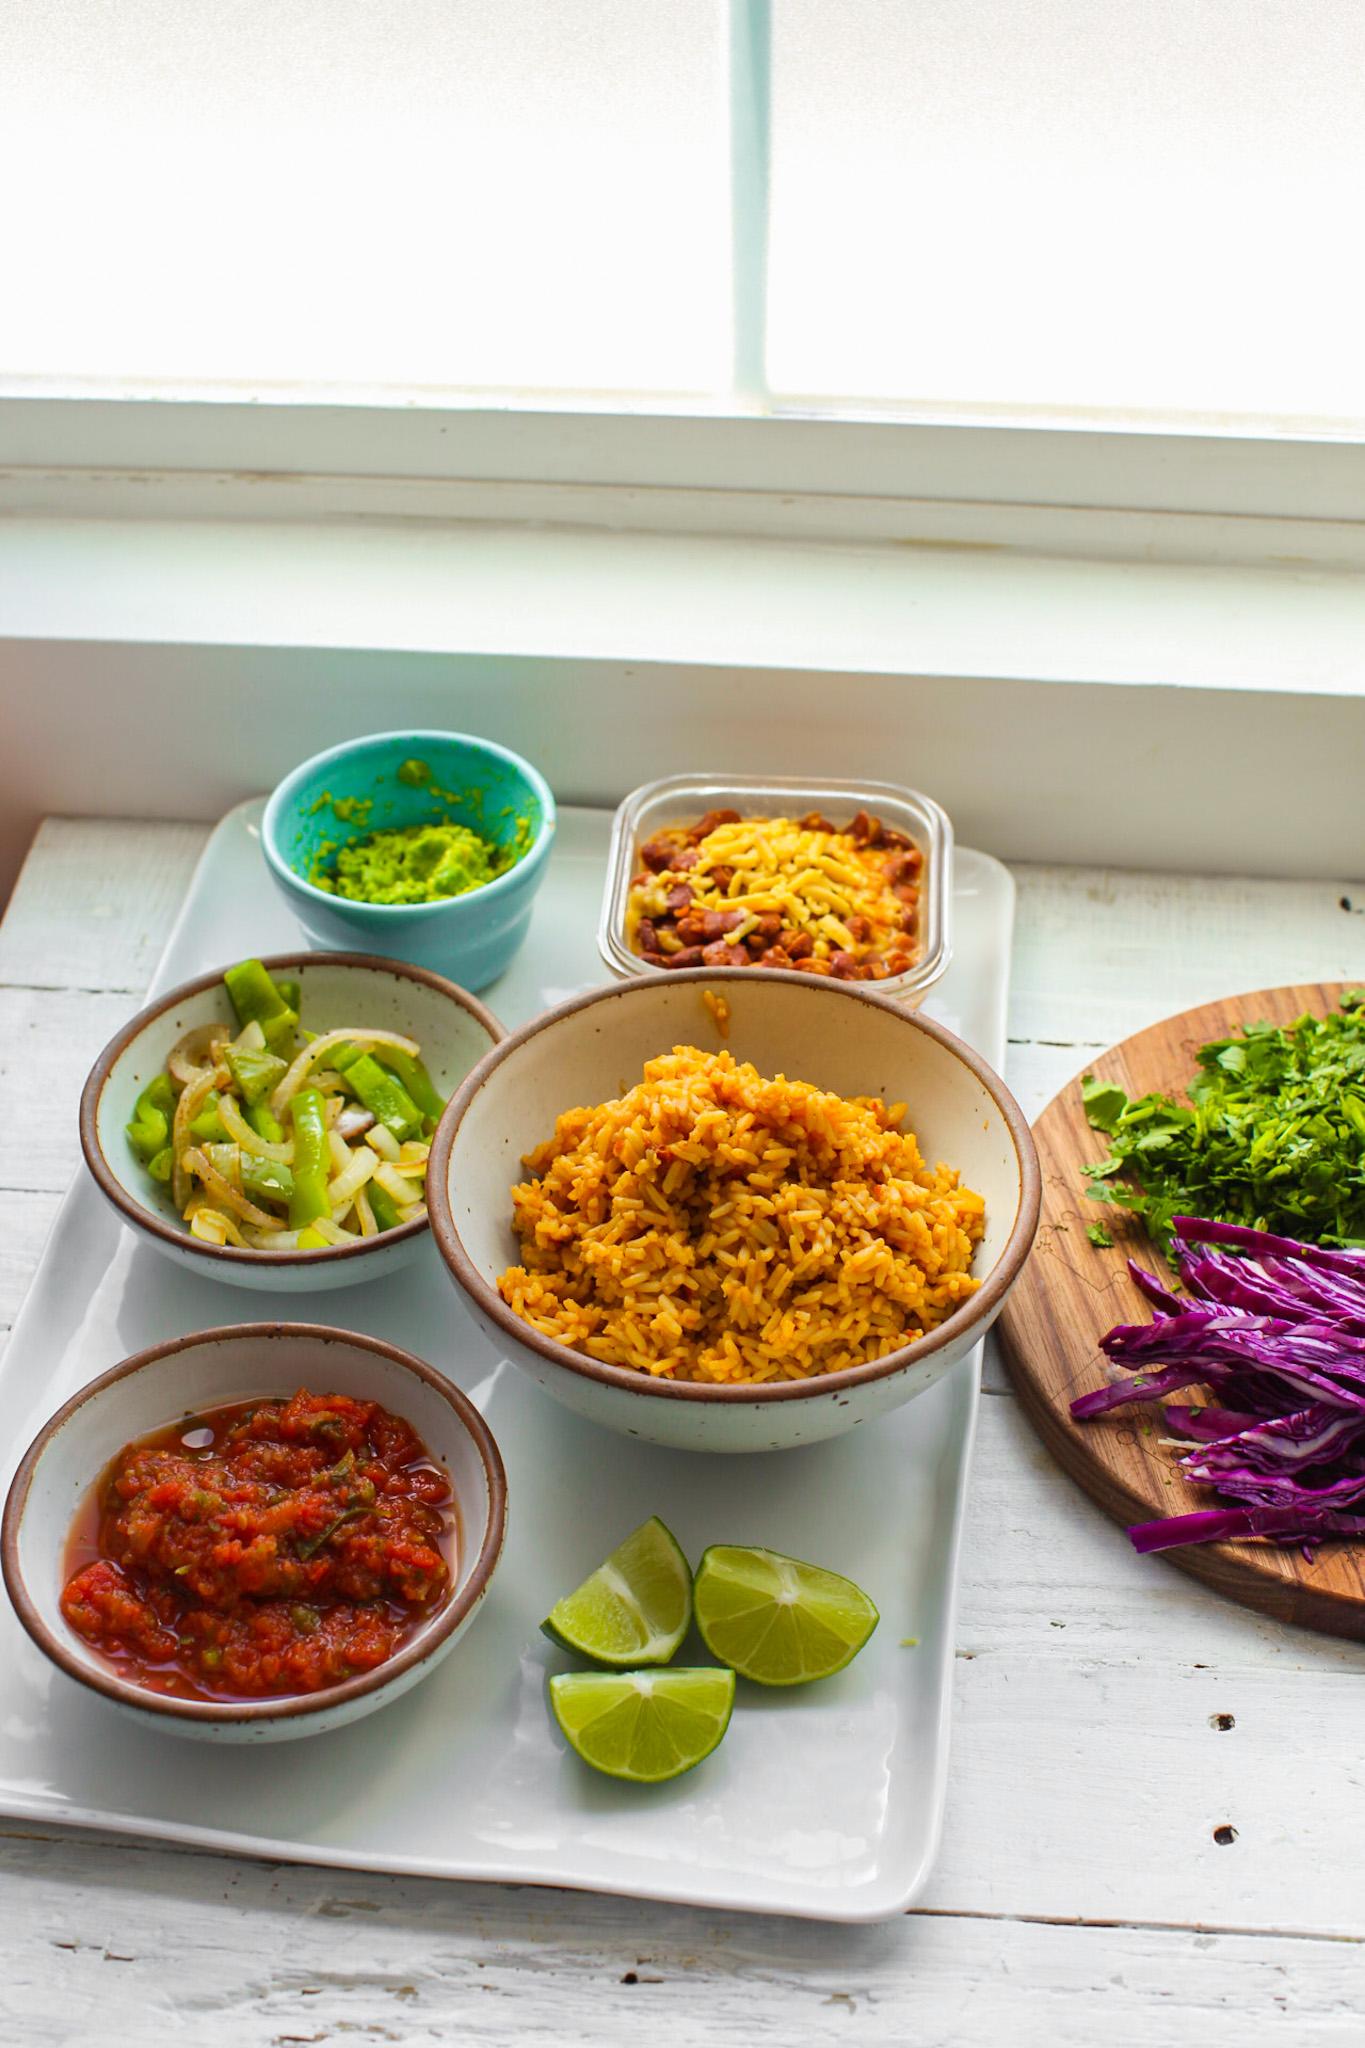 ingredients for a veggie burrito